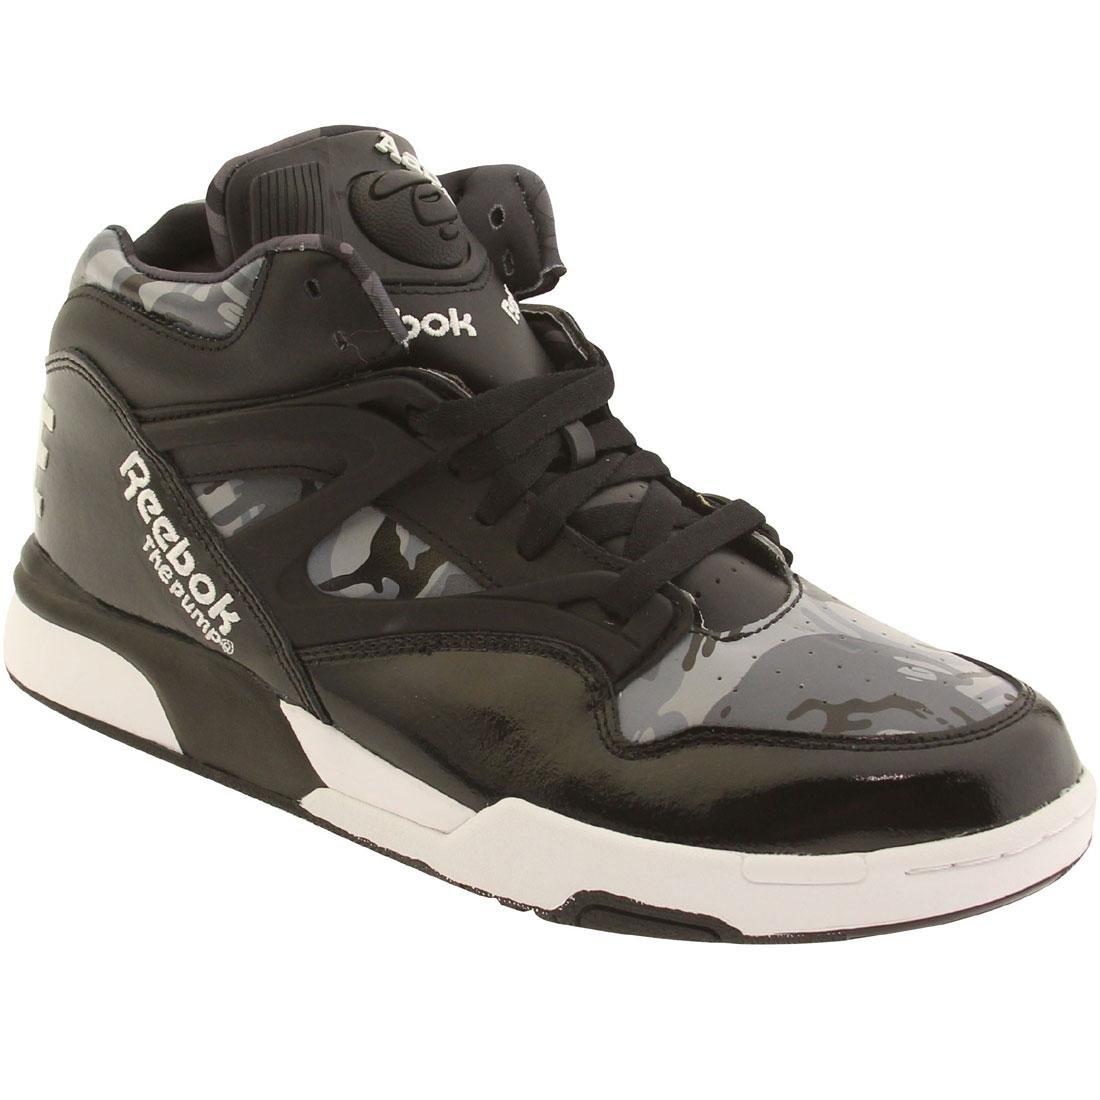 competitive price 7655c 9f9e2 Reebok x AAPE A Bathing Ape Men Pump Omni Lite (Black/camo / White):  Amazon.co.uk: Shoes & Bags